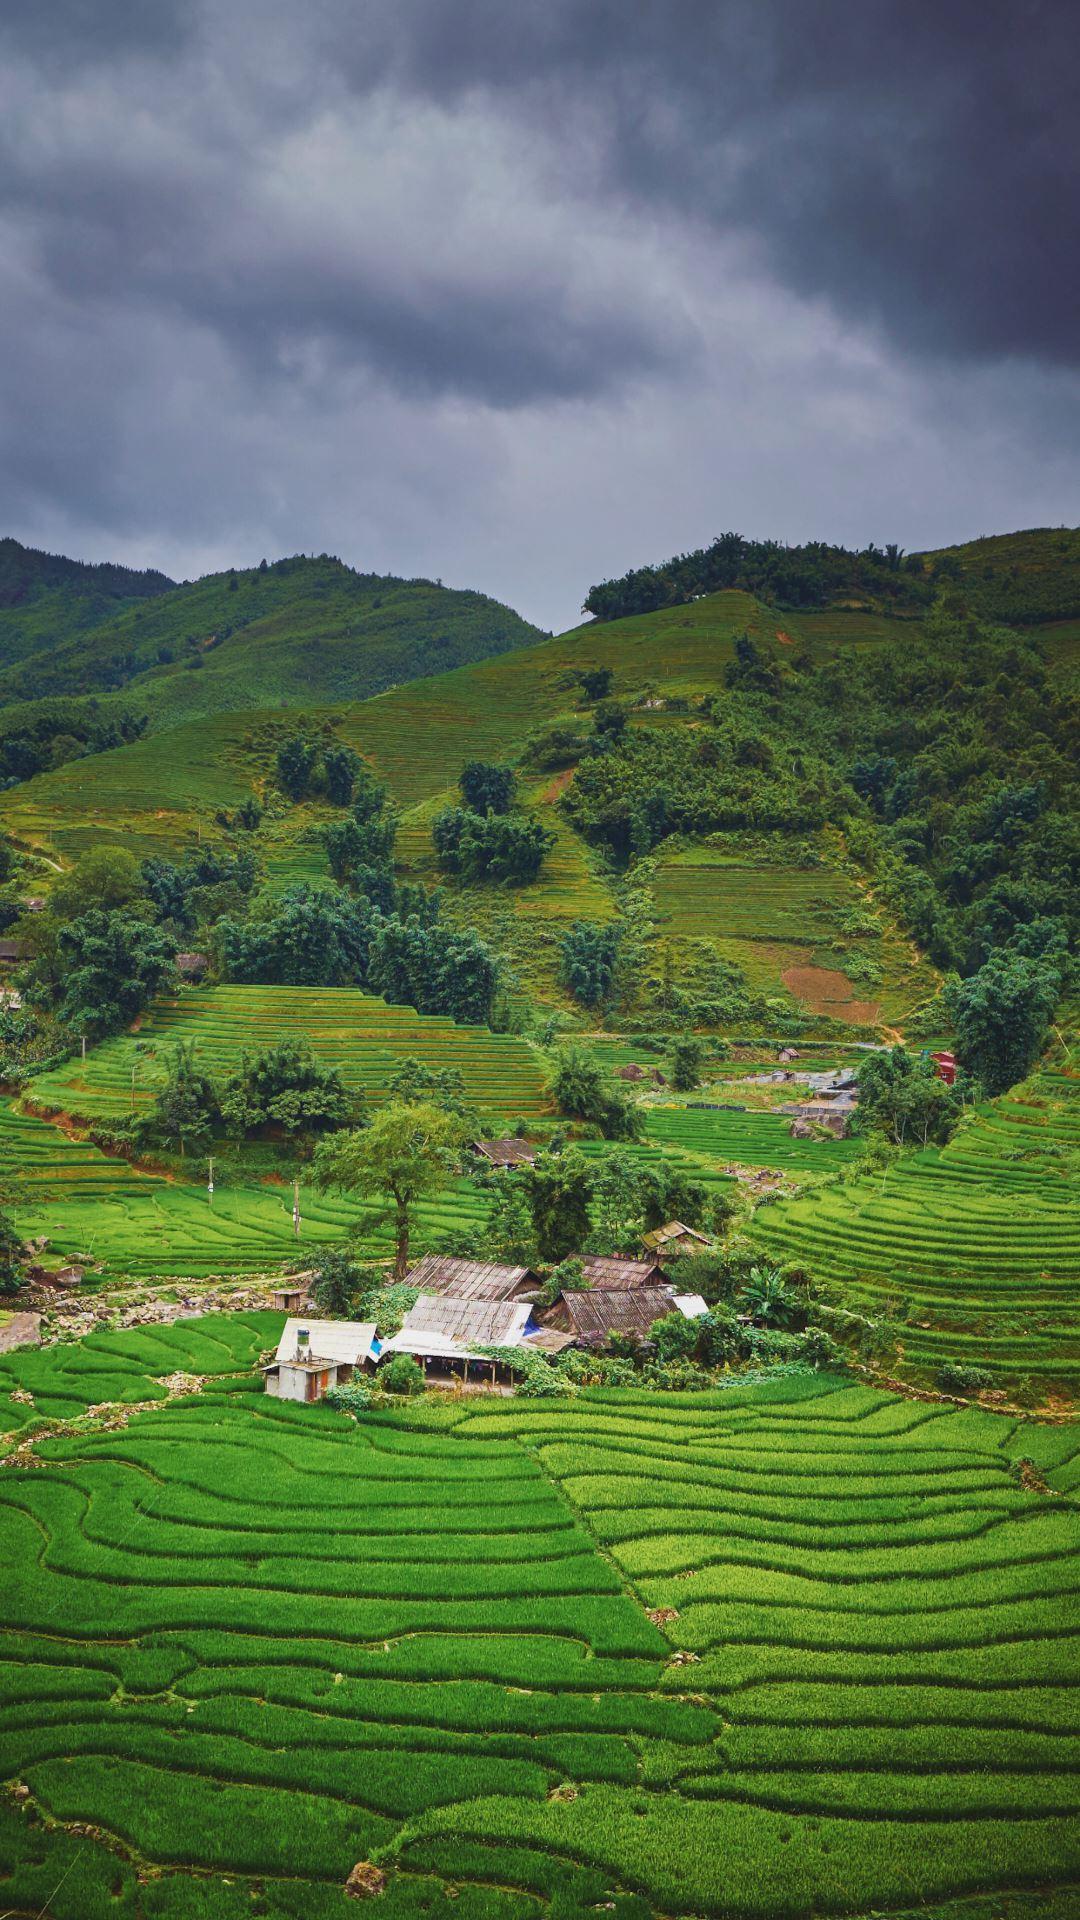 Wallpaper iPhone travel photography Vietnam green mountains rice fields storm